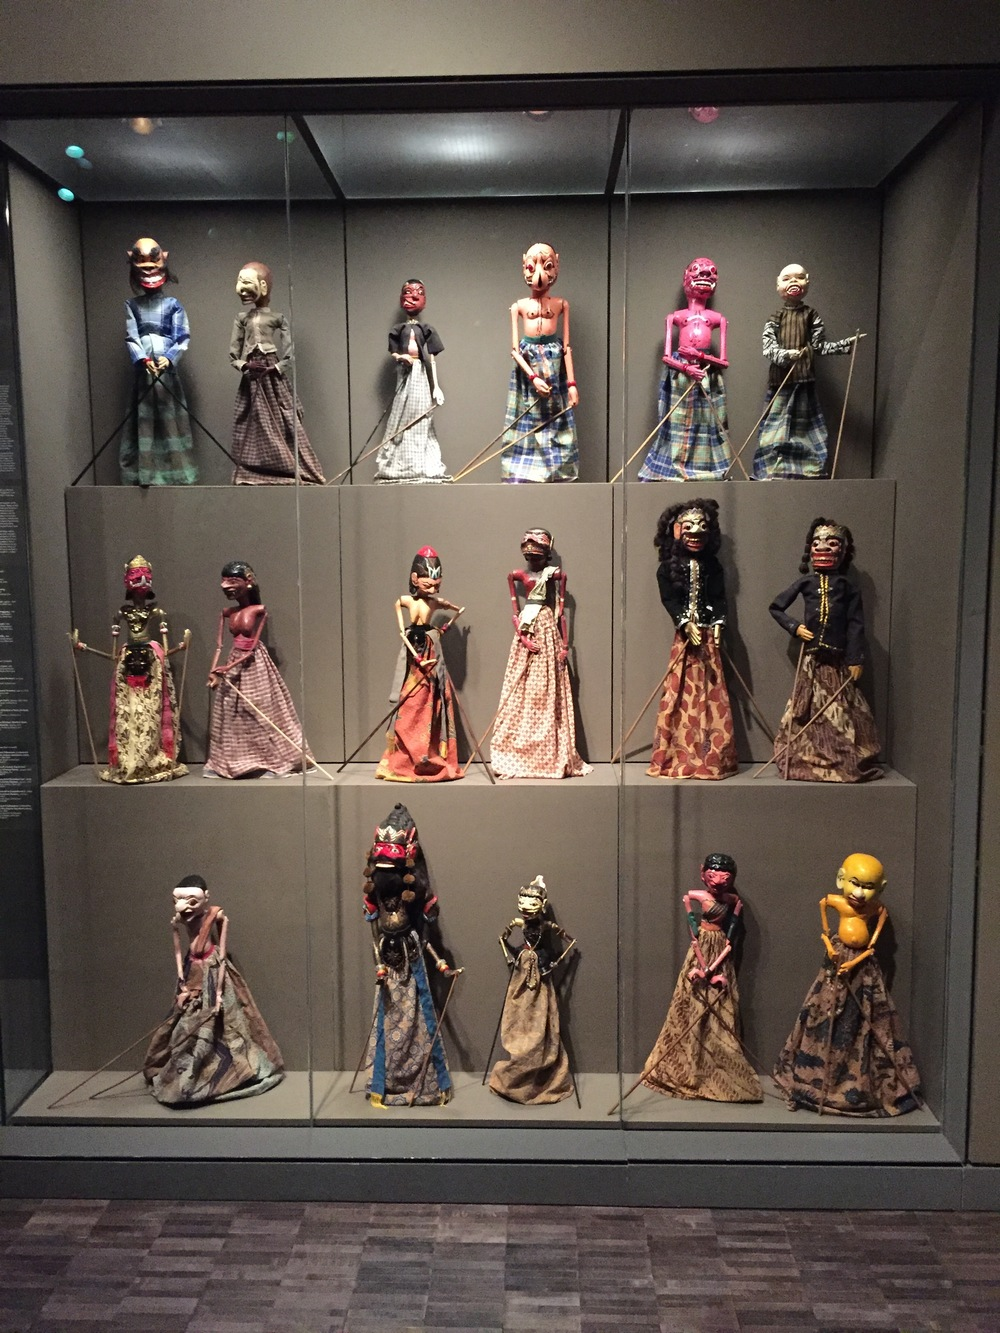 Wayang Golek (Rod Puppets)